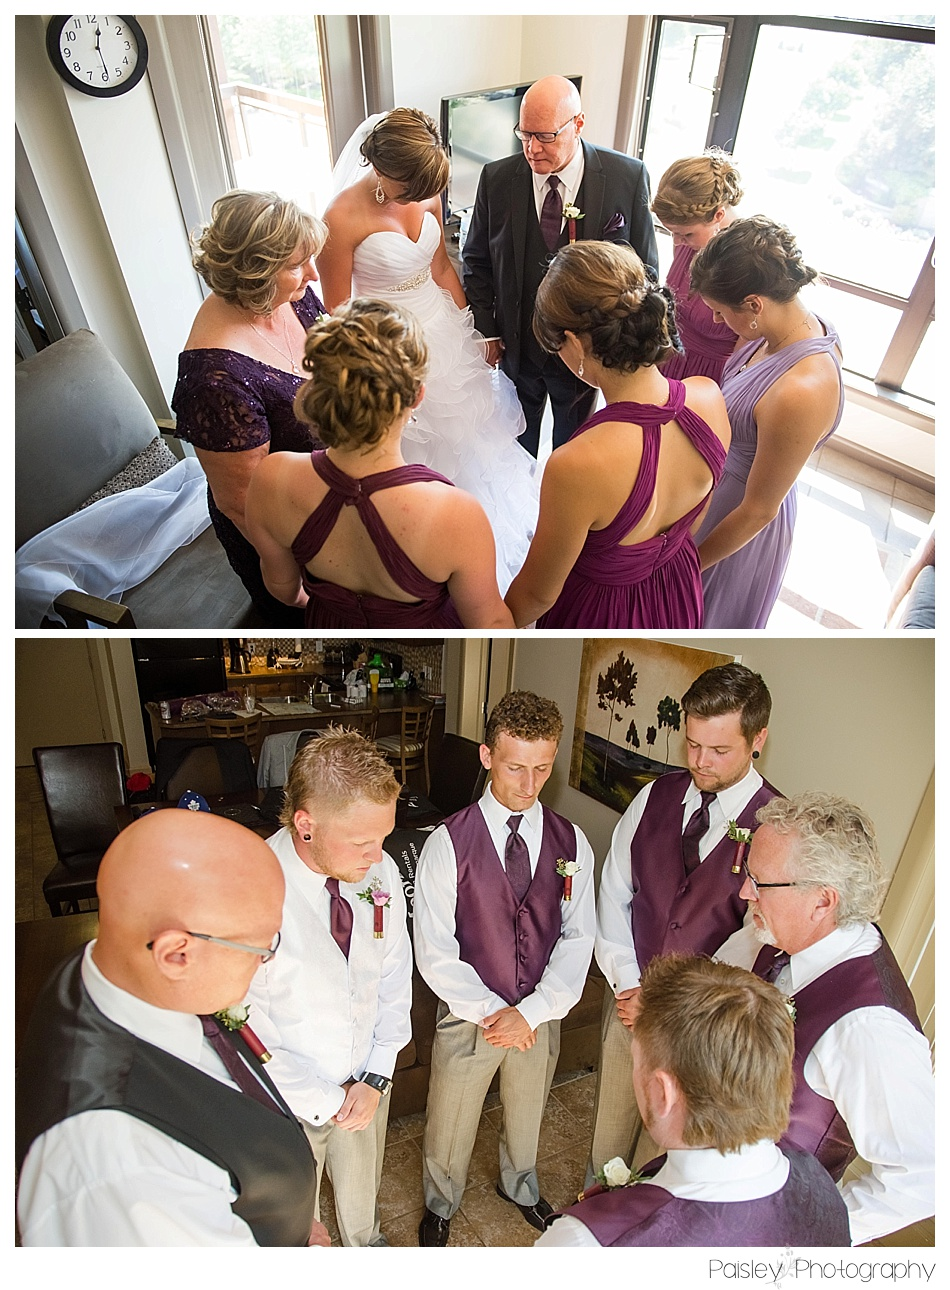 Before Wedding Prayer, Kelowna Wedding Photography, Okanagan Wedding Photographer, Playa Del Sol Wedding, Manteo Wedding Photography, Manteo Wedding Venue Kelowna, Kelowna Wedding, Kelowna Wedding Photography